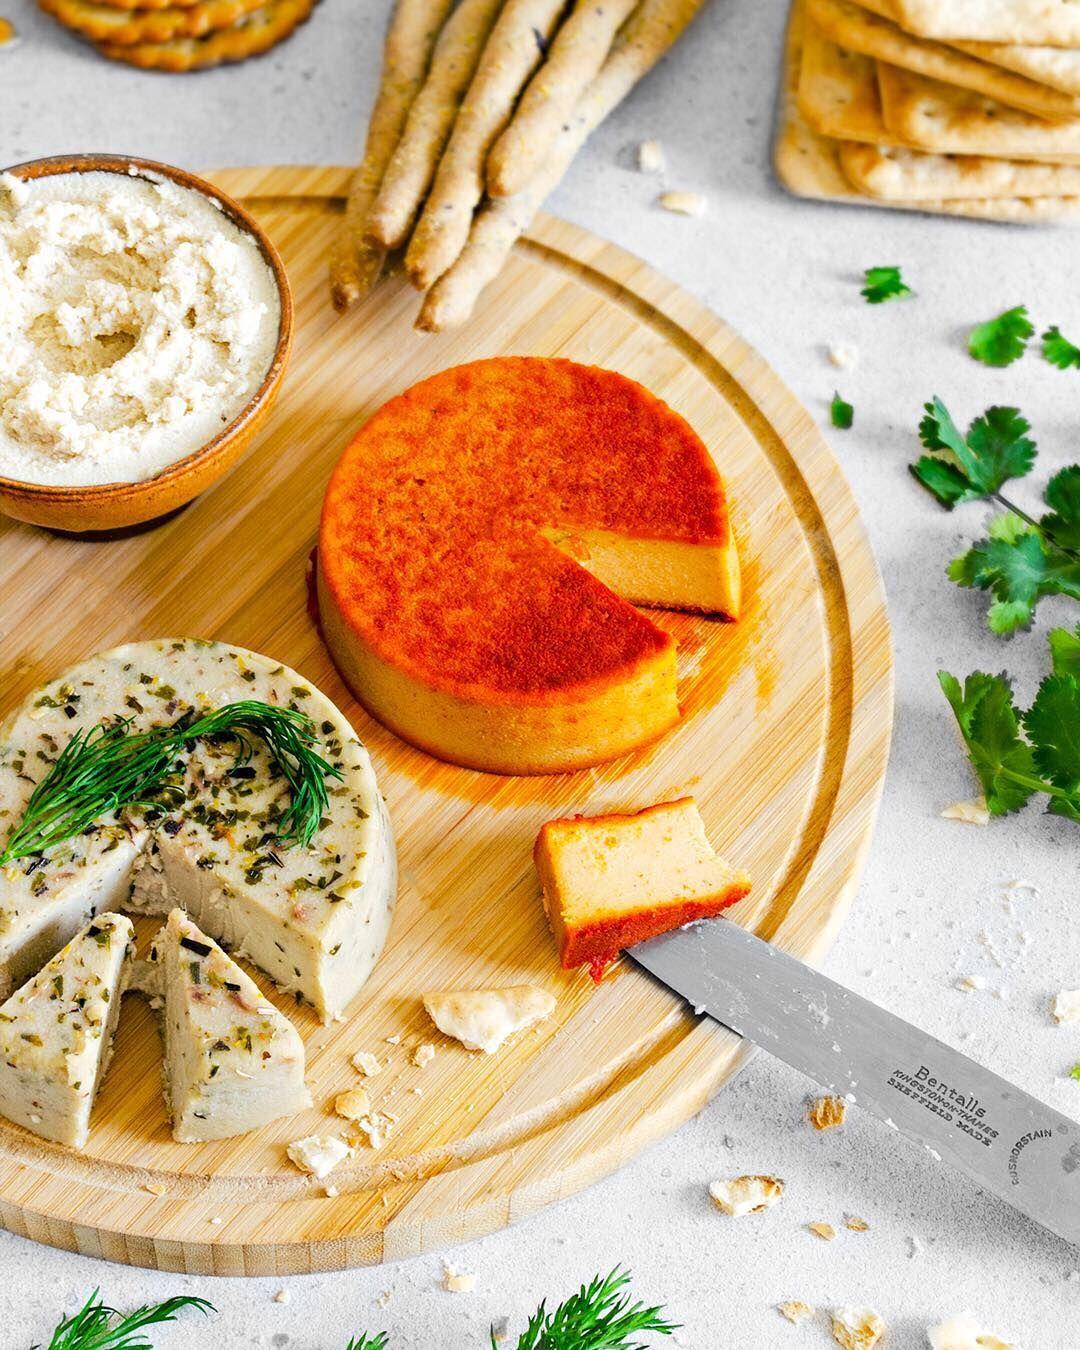 Vegan Cheese Board Healthy Vegan Snacks Vegan Side Dishes Vegan Cheese Boards